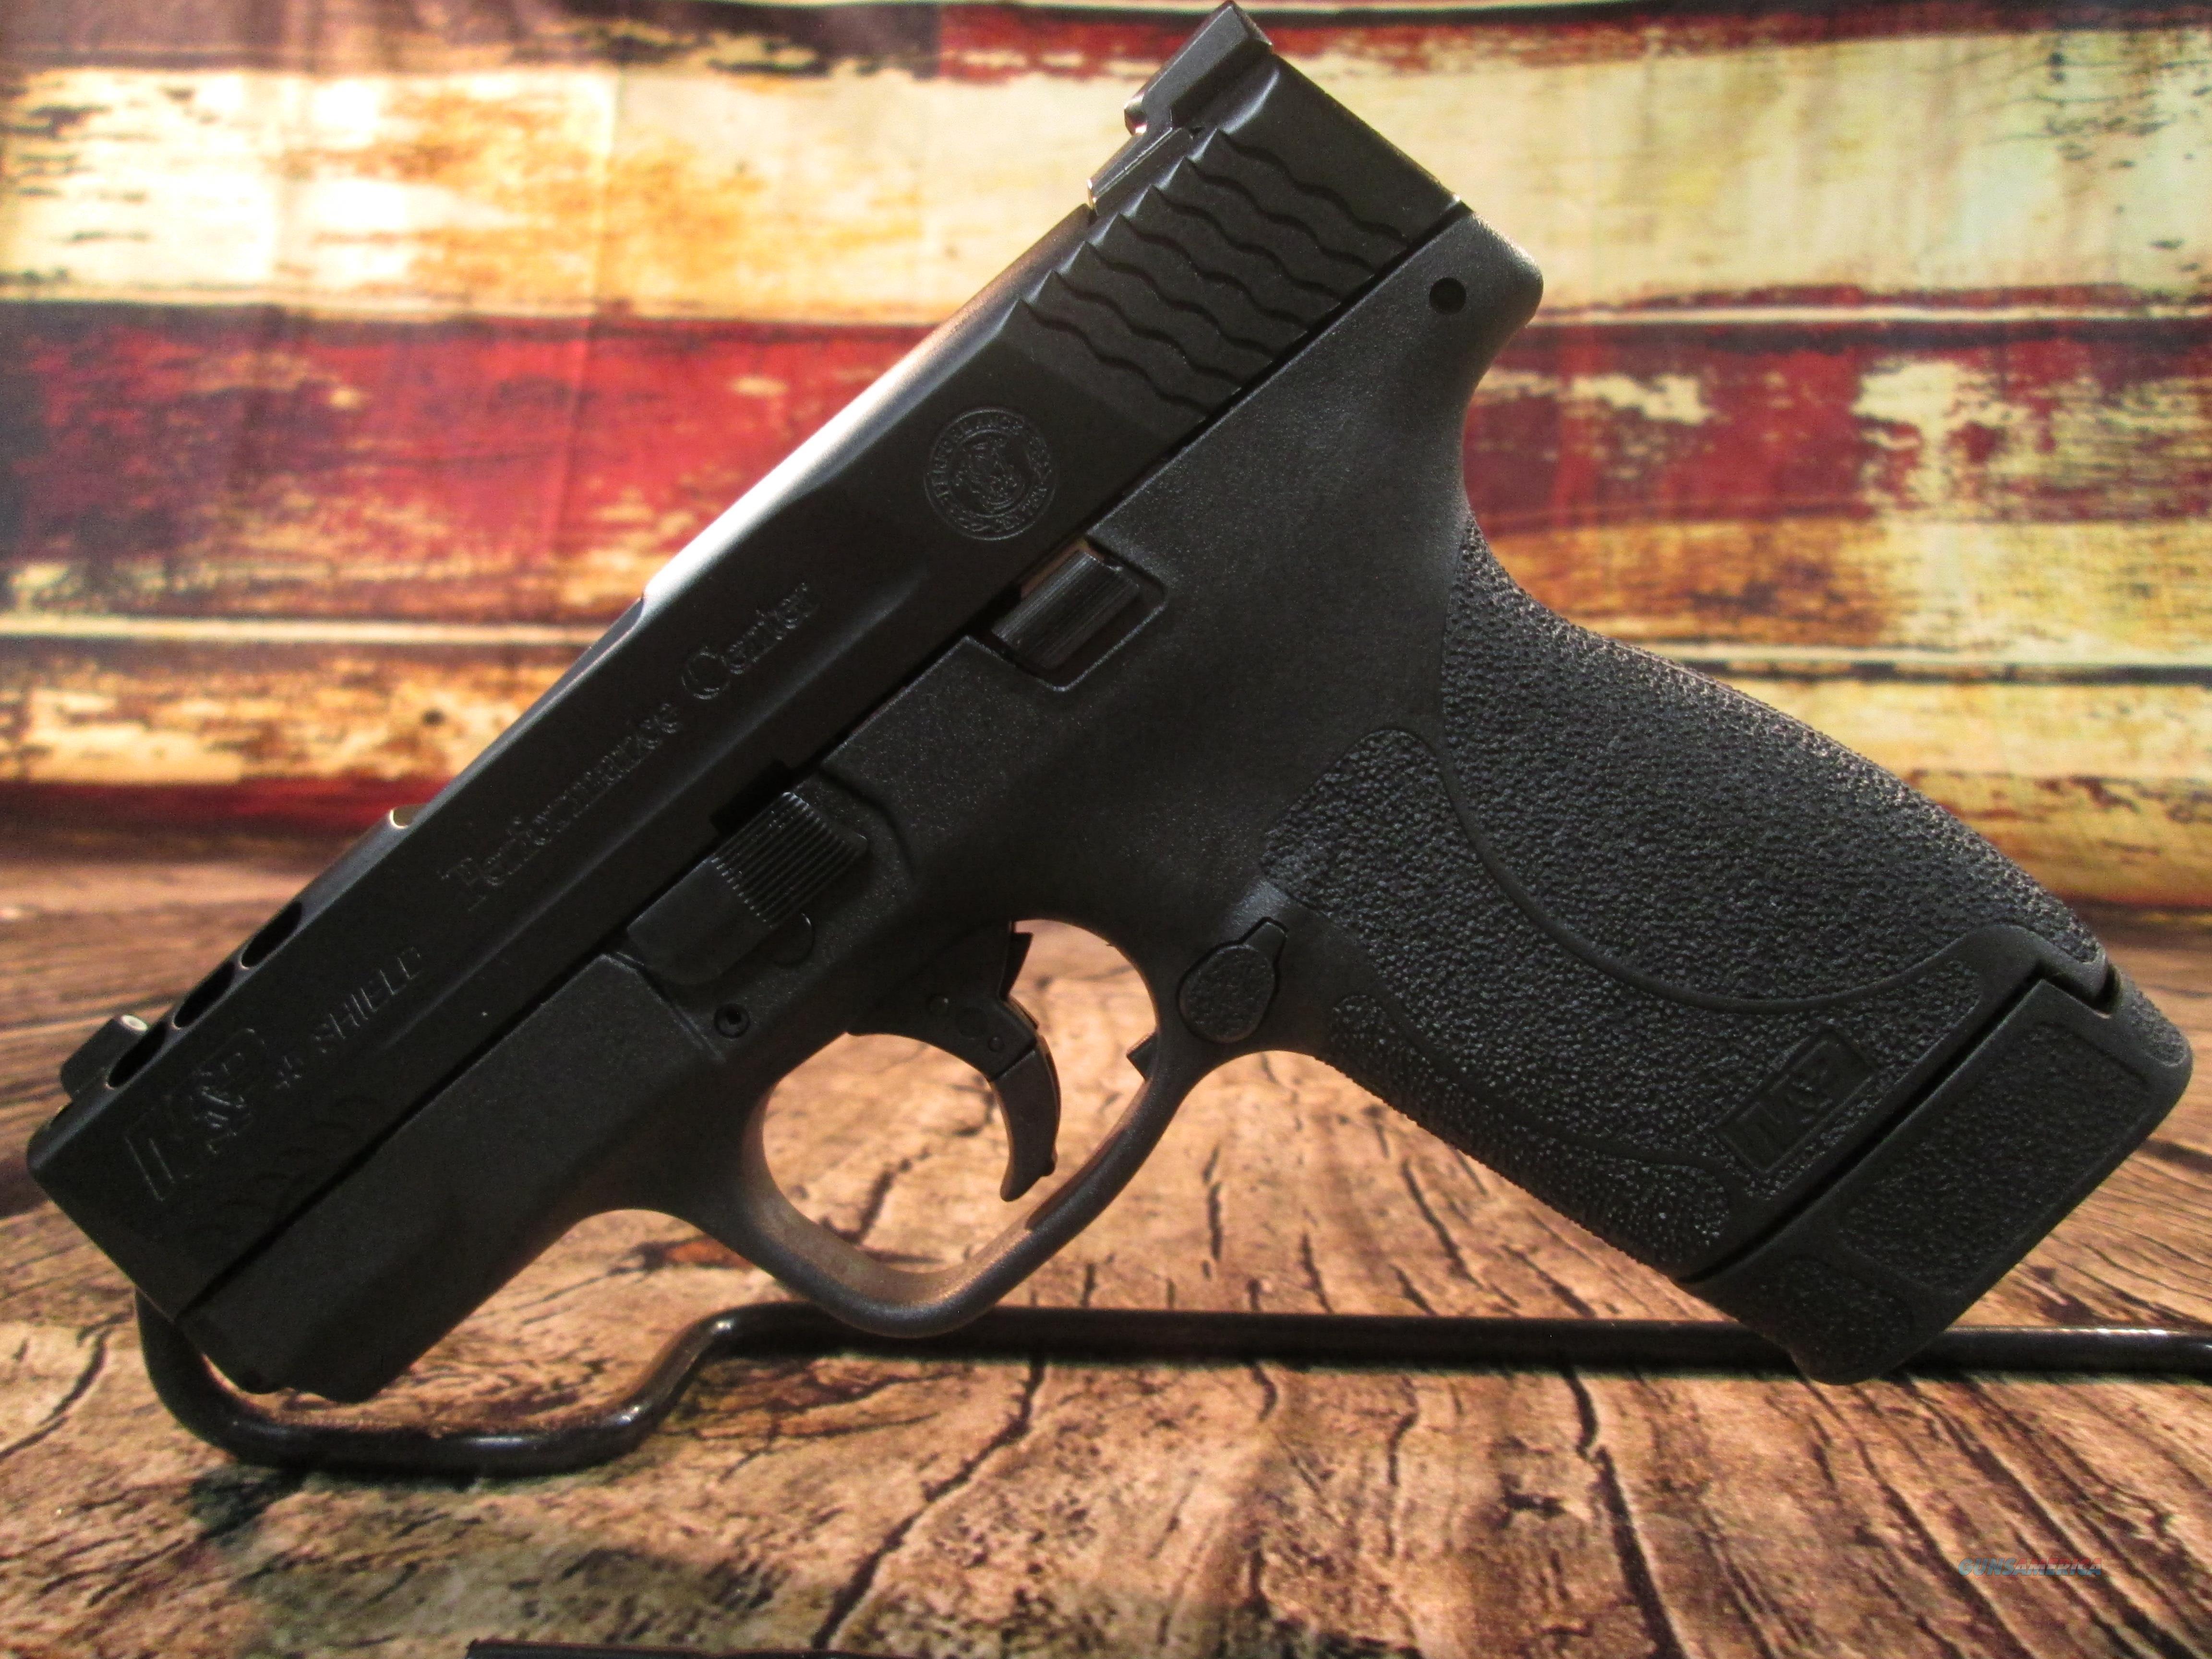 SMITH & WESSON  PERFORMANCE CENTER M&P SHIELD 45 ACP (11727)  Guns > Pistols > Smith & Wesson Pistols - Autos > Shield